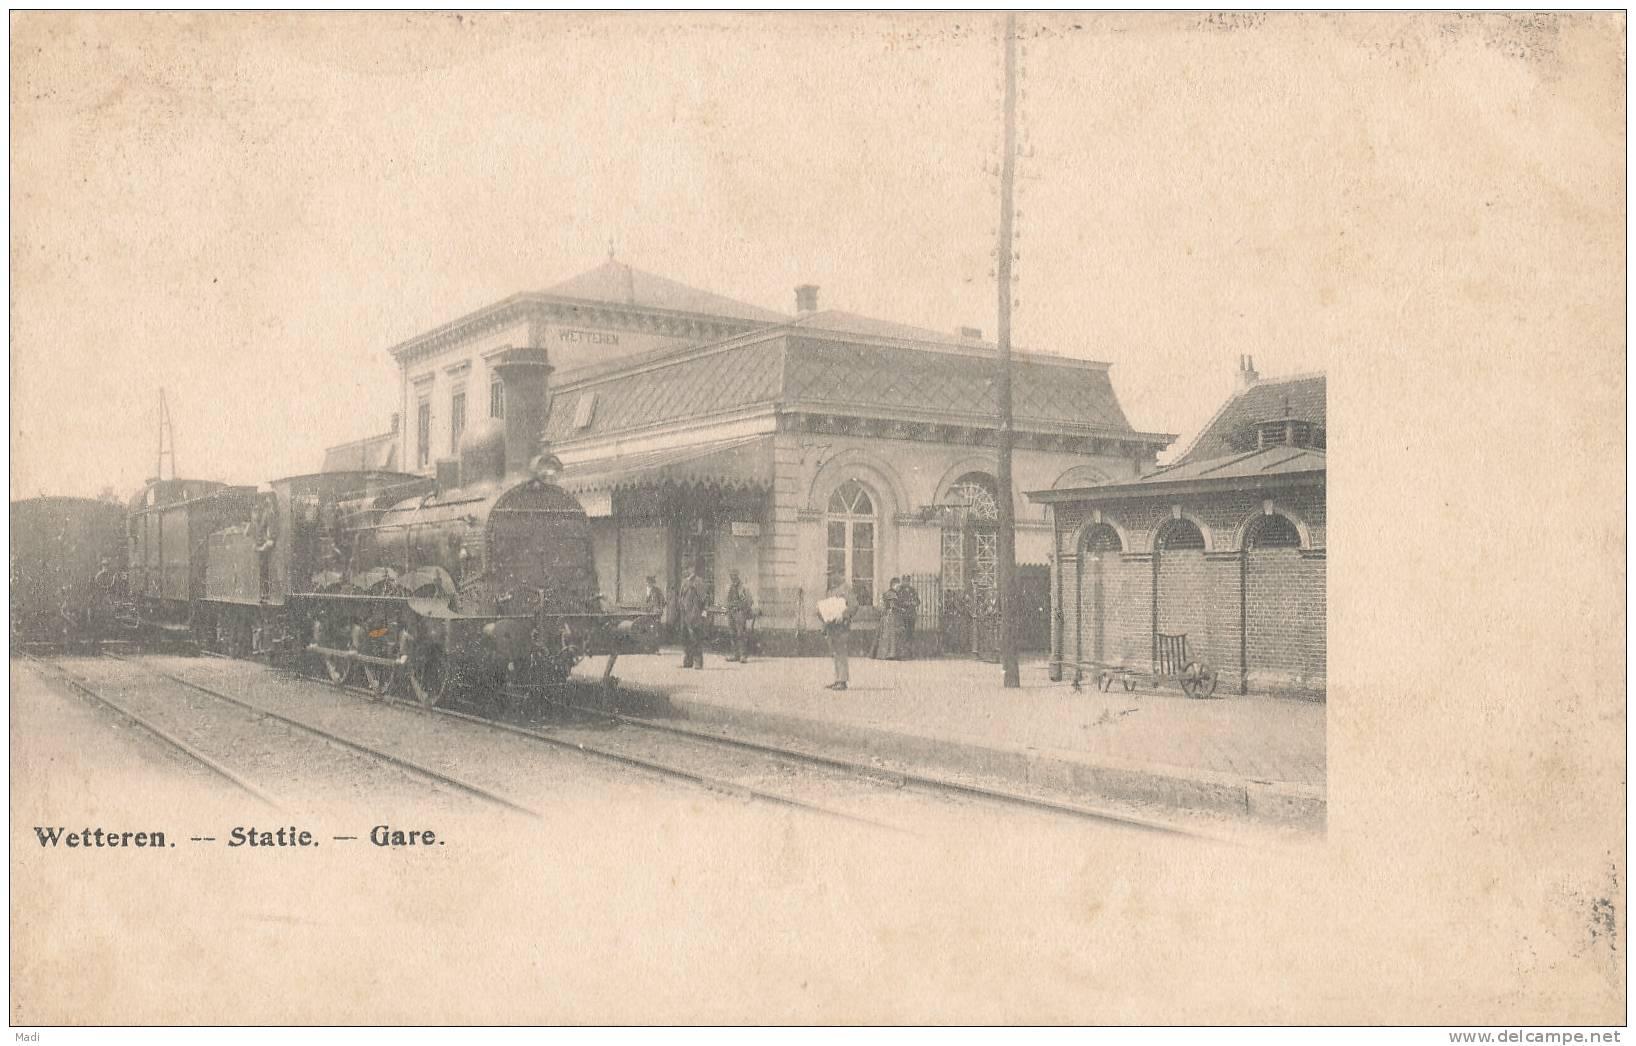 Wetteren - Statie - Gare - Trein - Wetteren